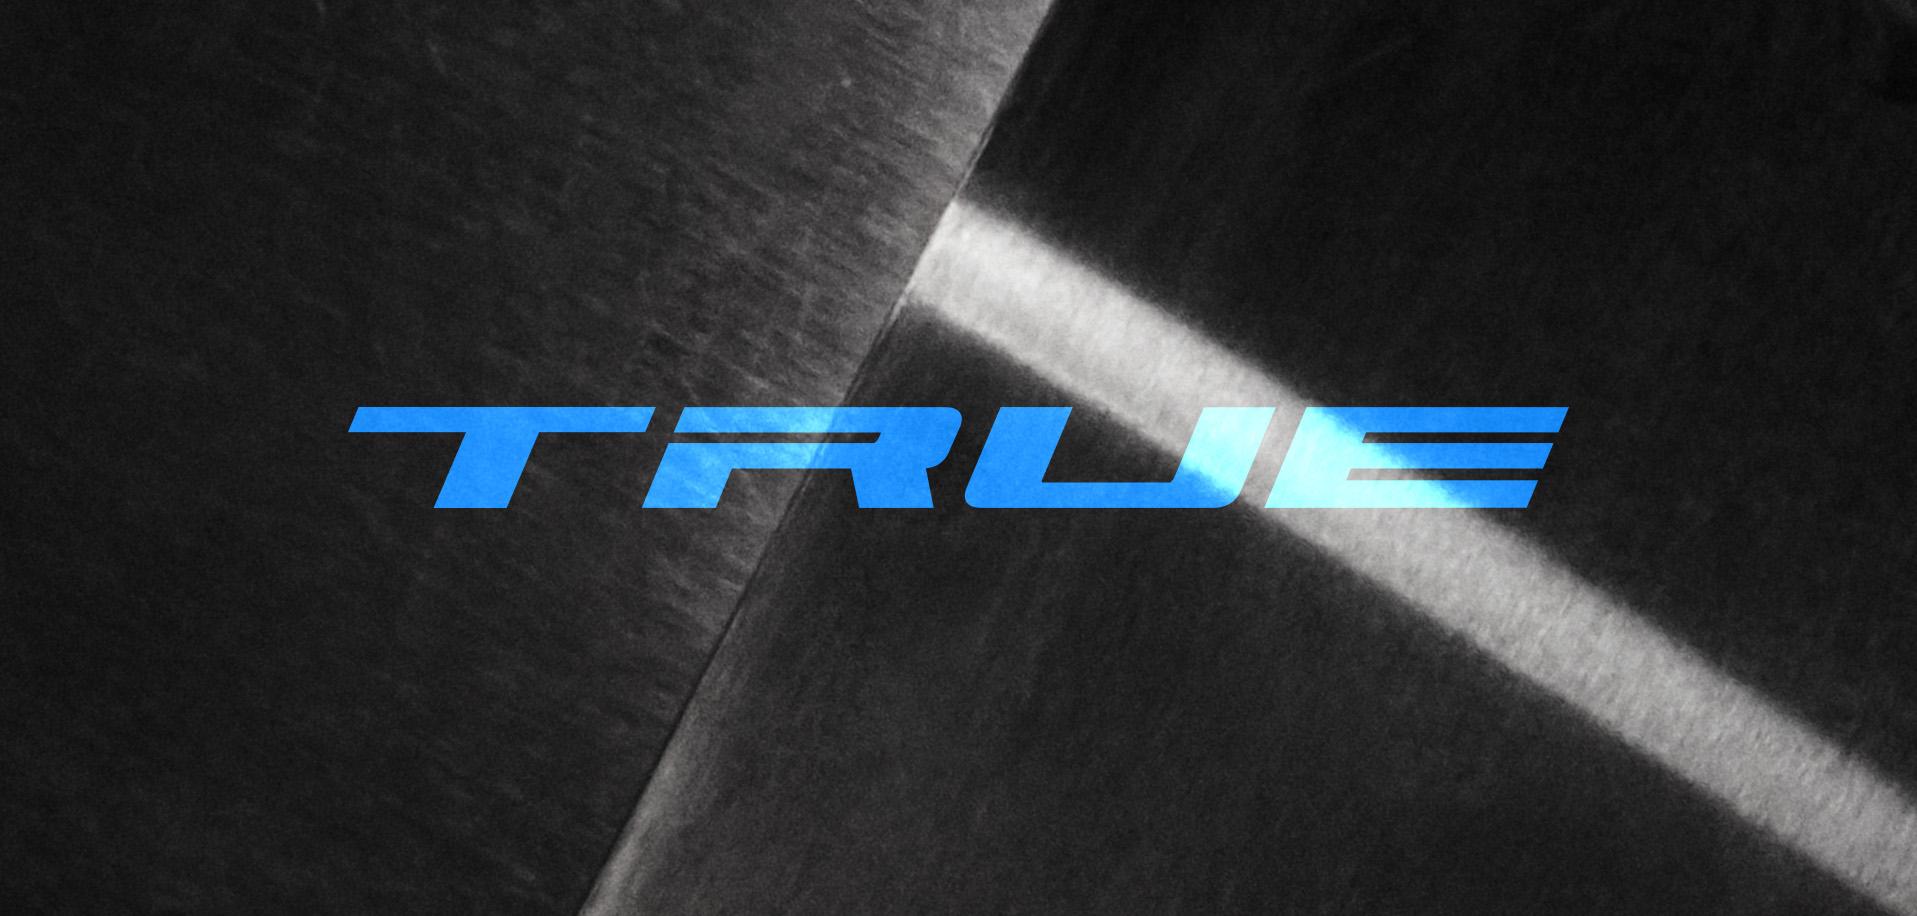 ture-hockey-thumbnail.jpg